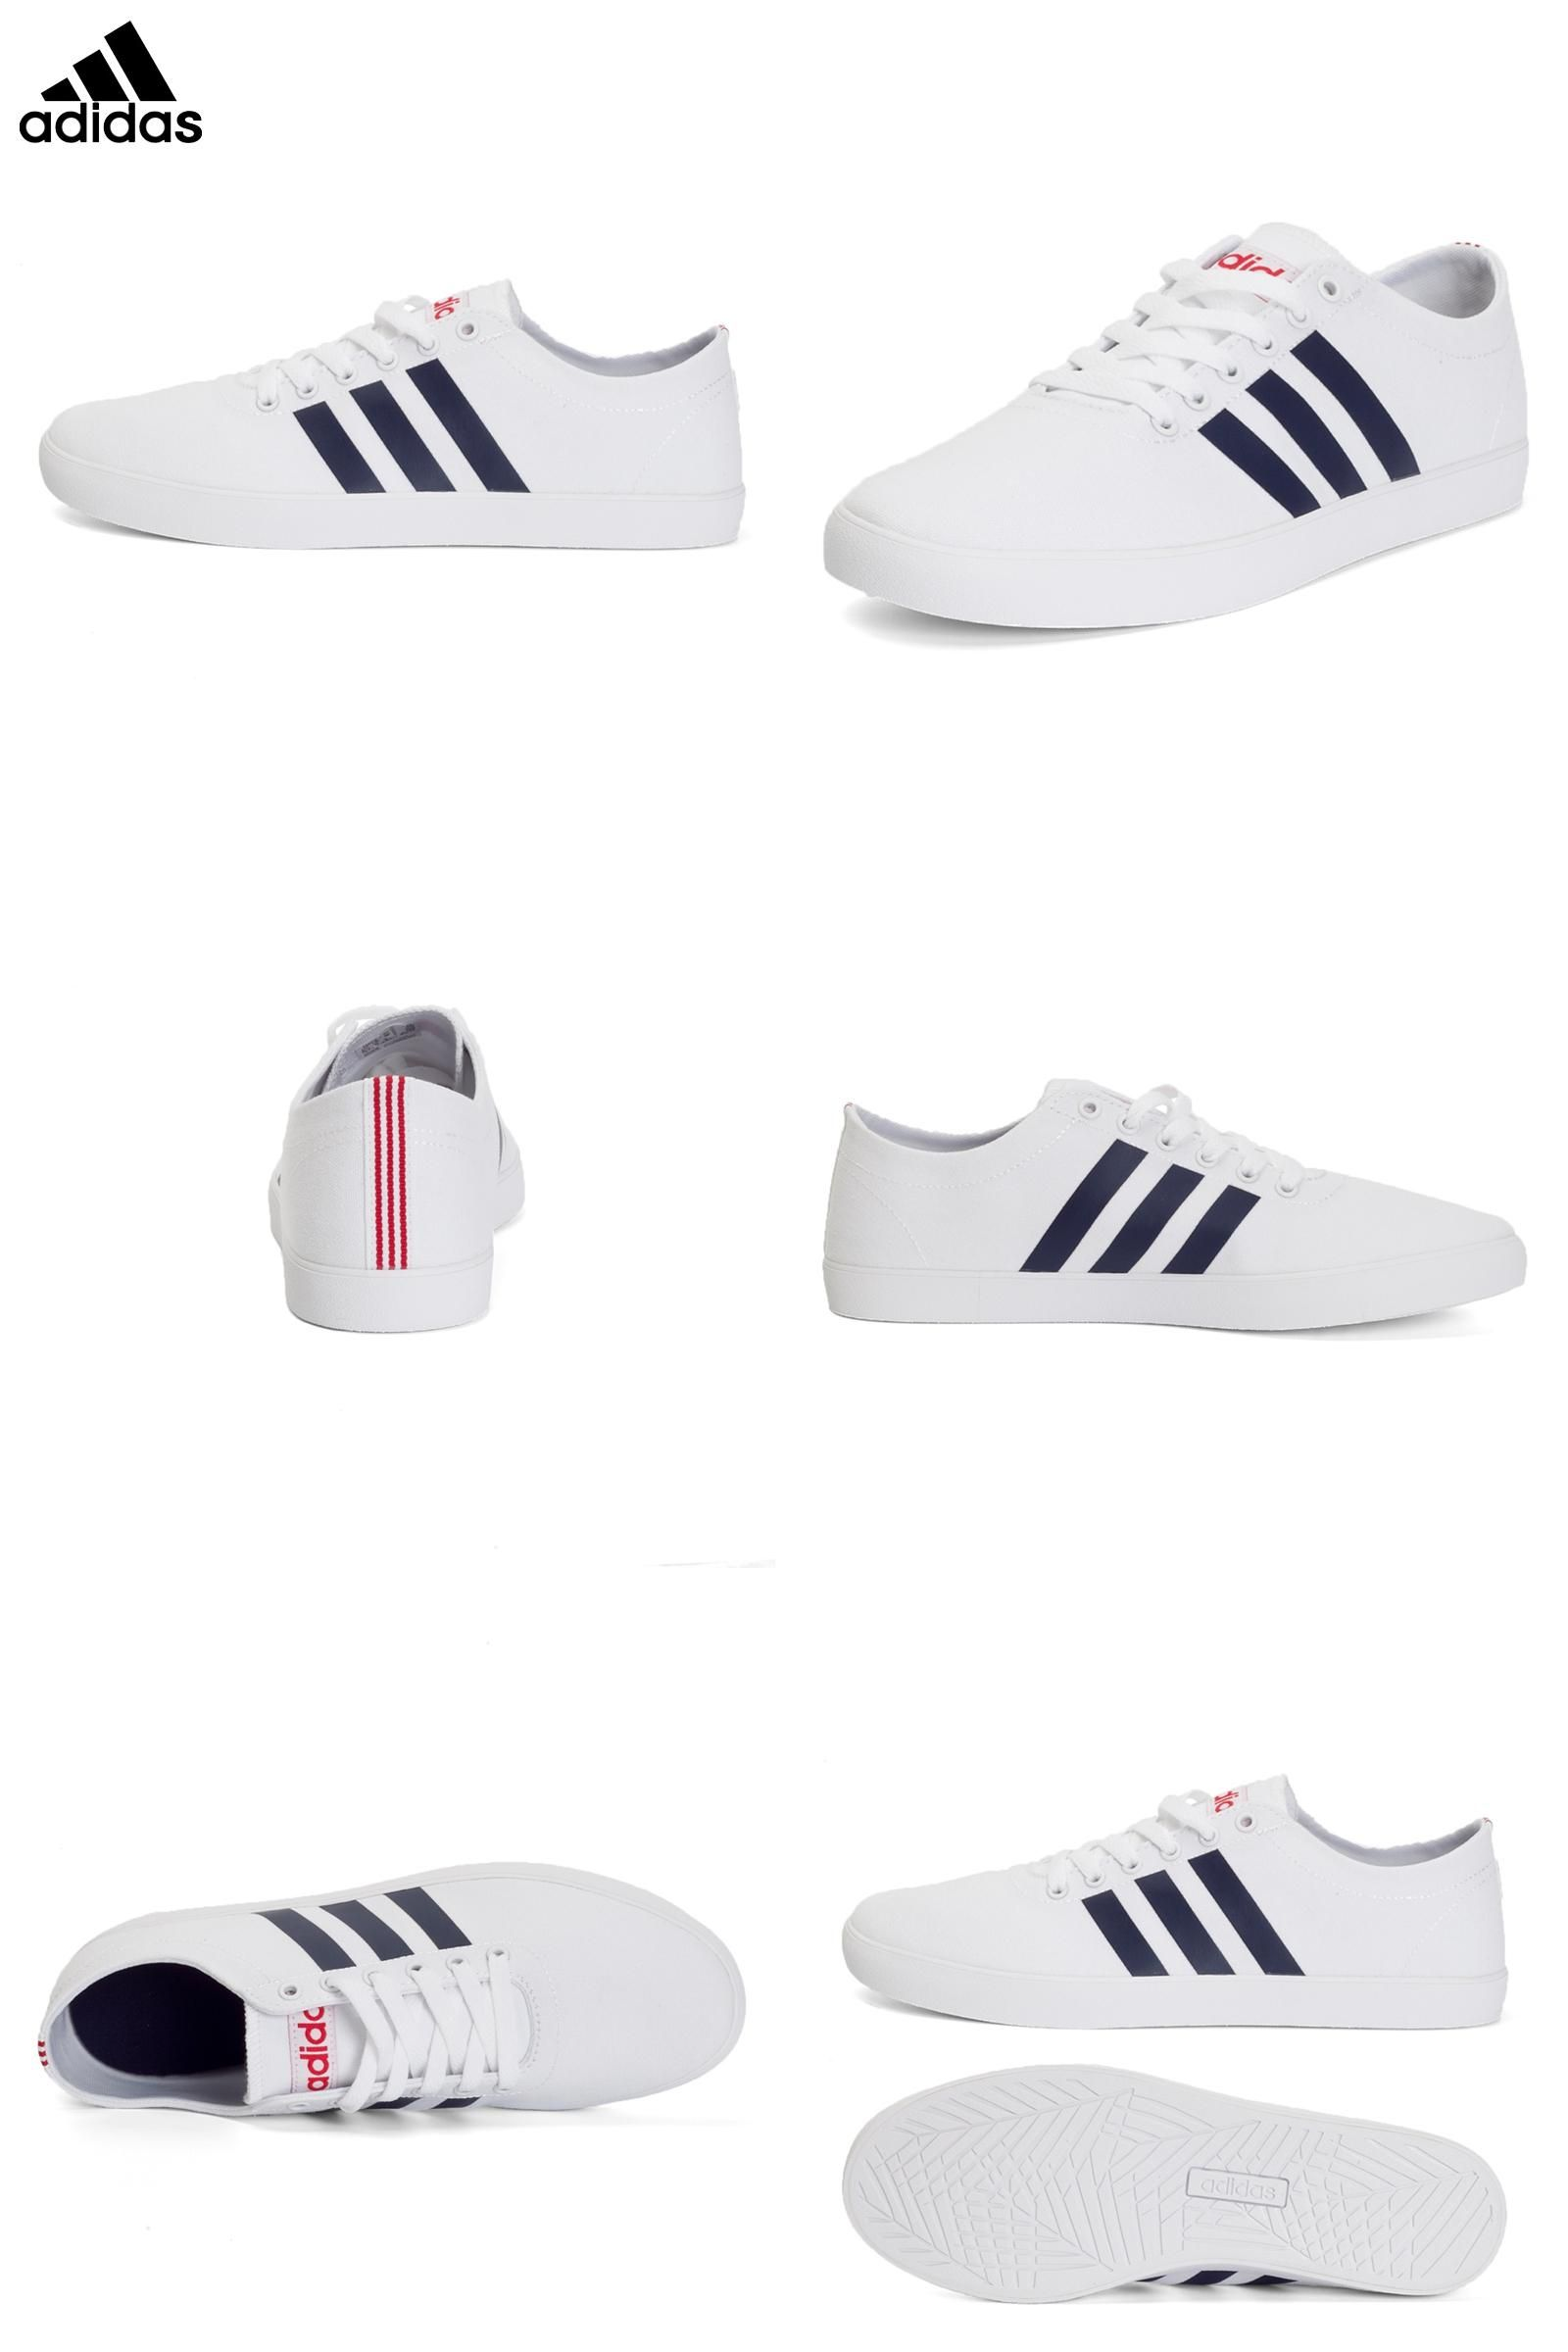 adidas neo label classic vulc